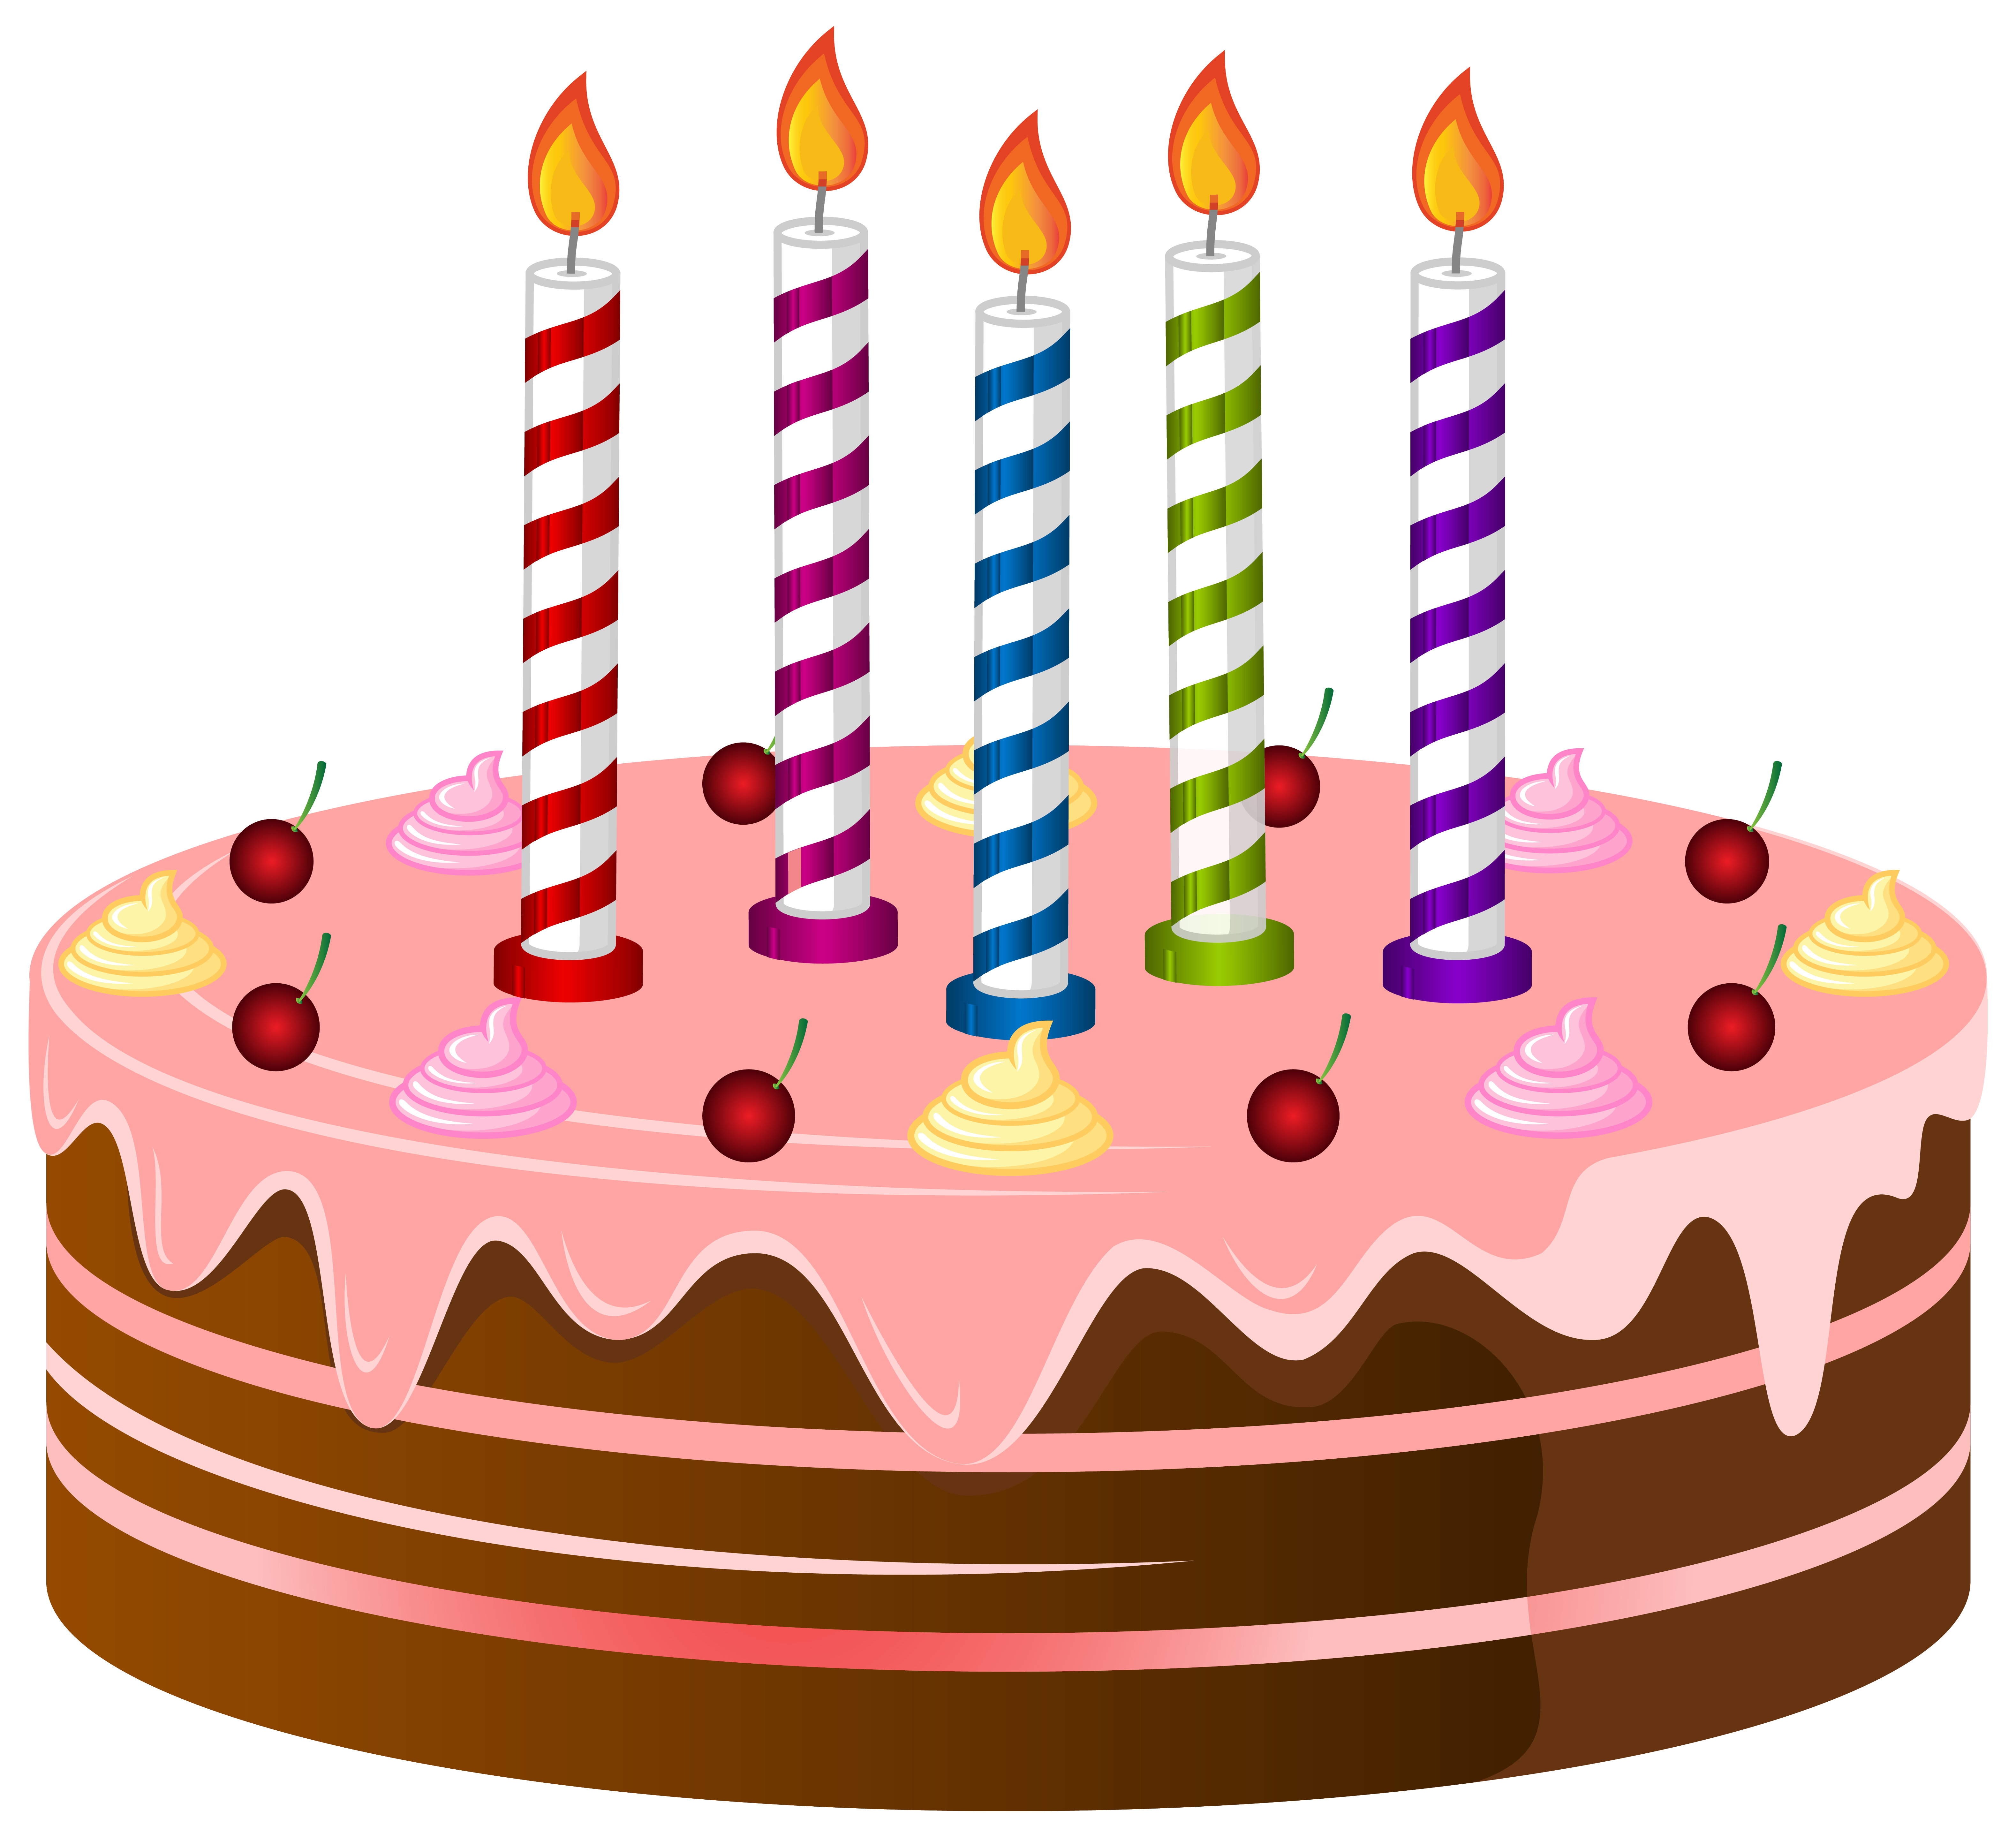 Birthday cake art cake birthday clipart 4 cakes